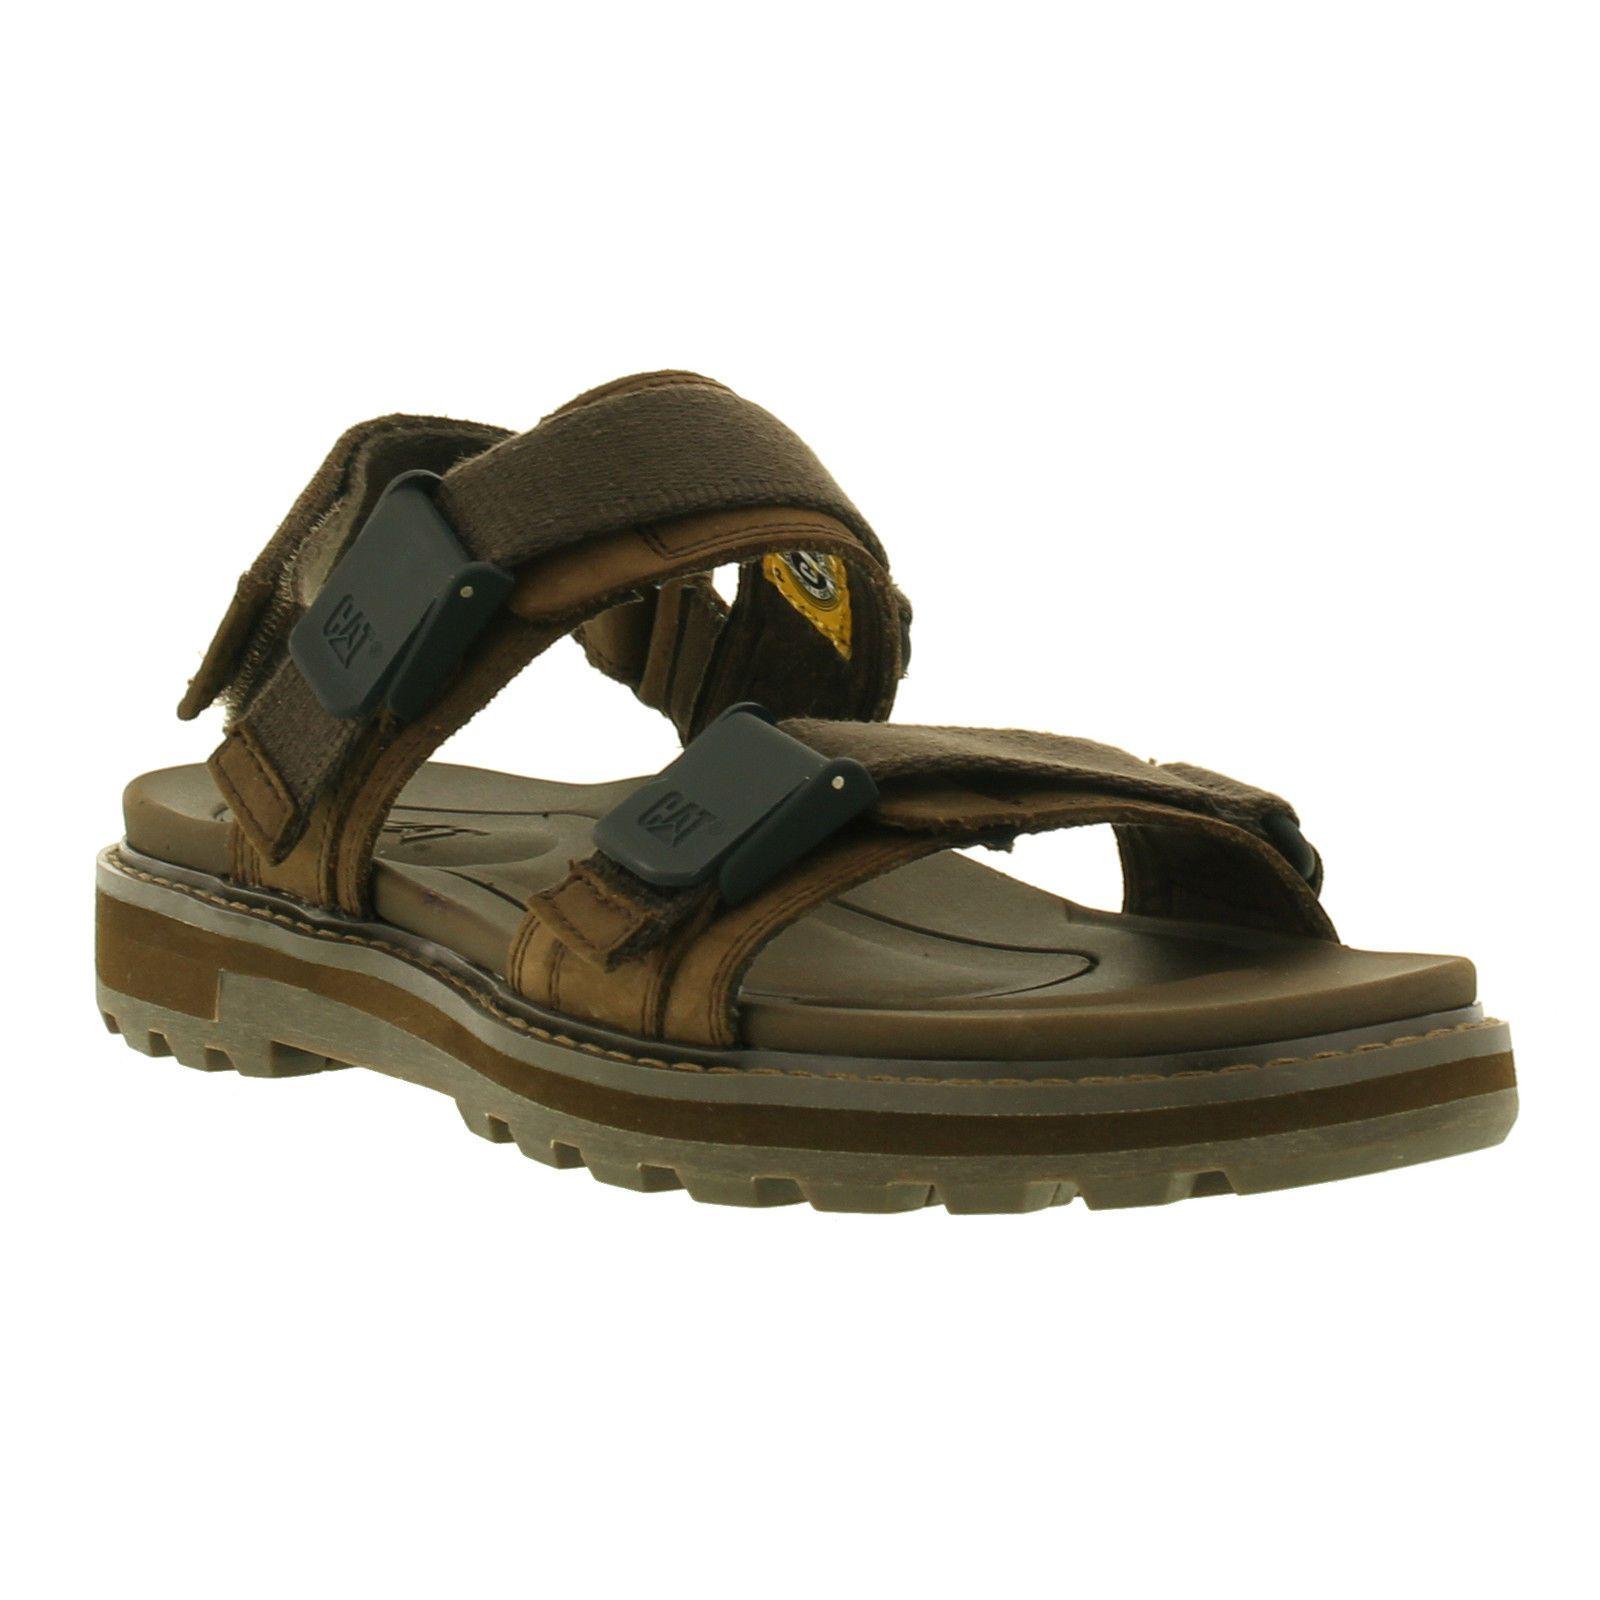 5242882e8 Caterpillar Drifter Mens Wide Fit Adjustable Leather Cat Sandals Size Uk  6-12